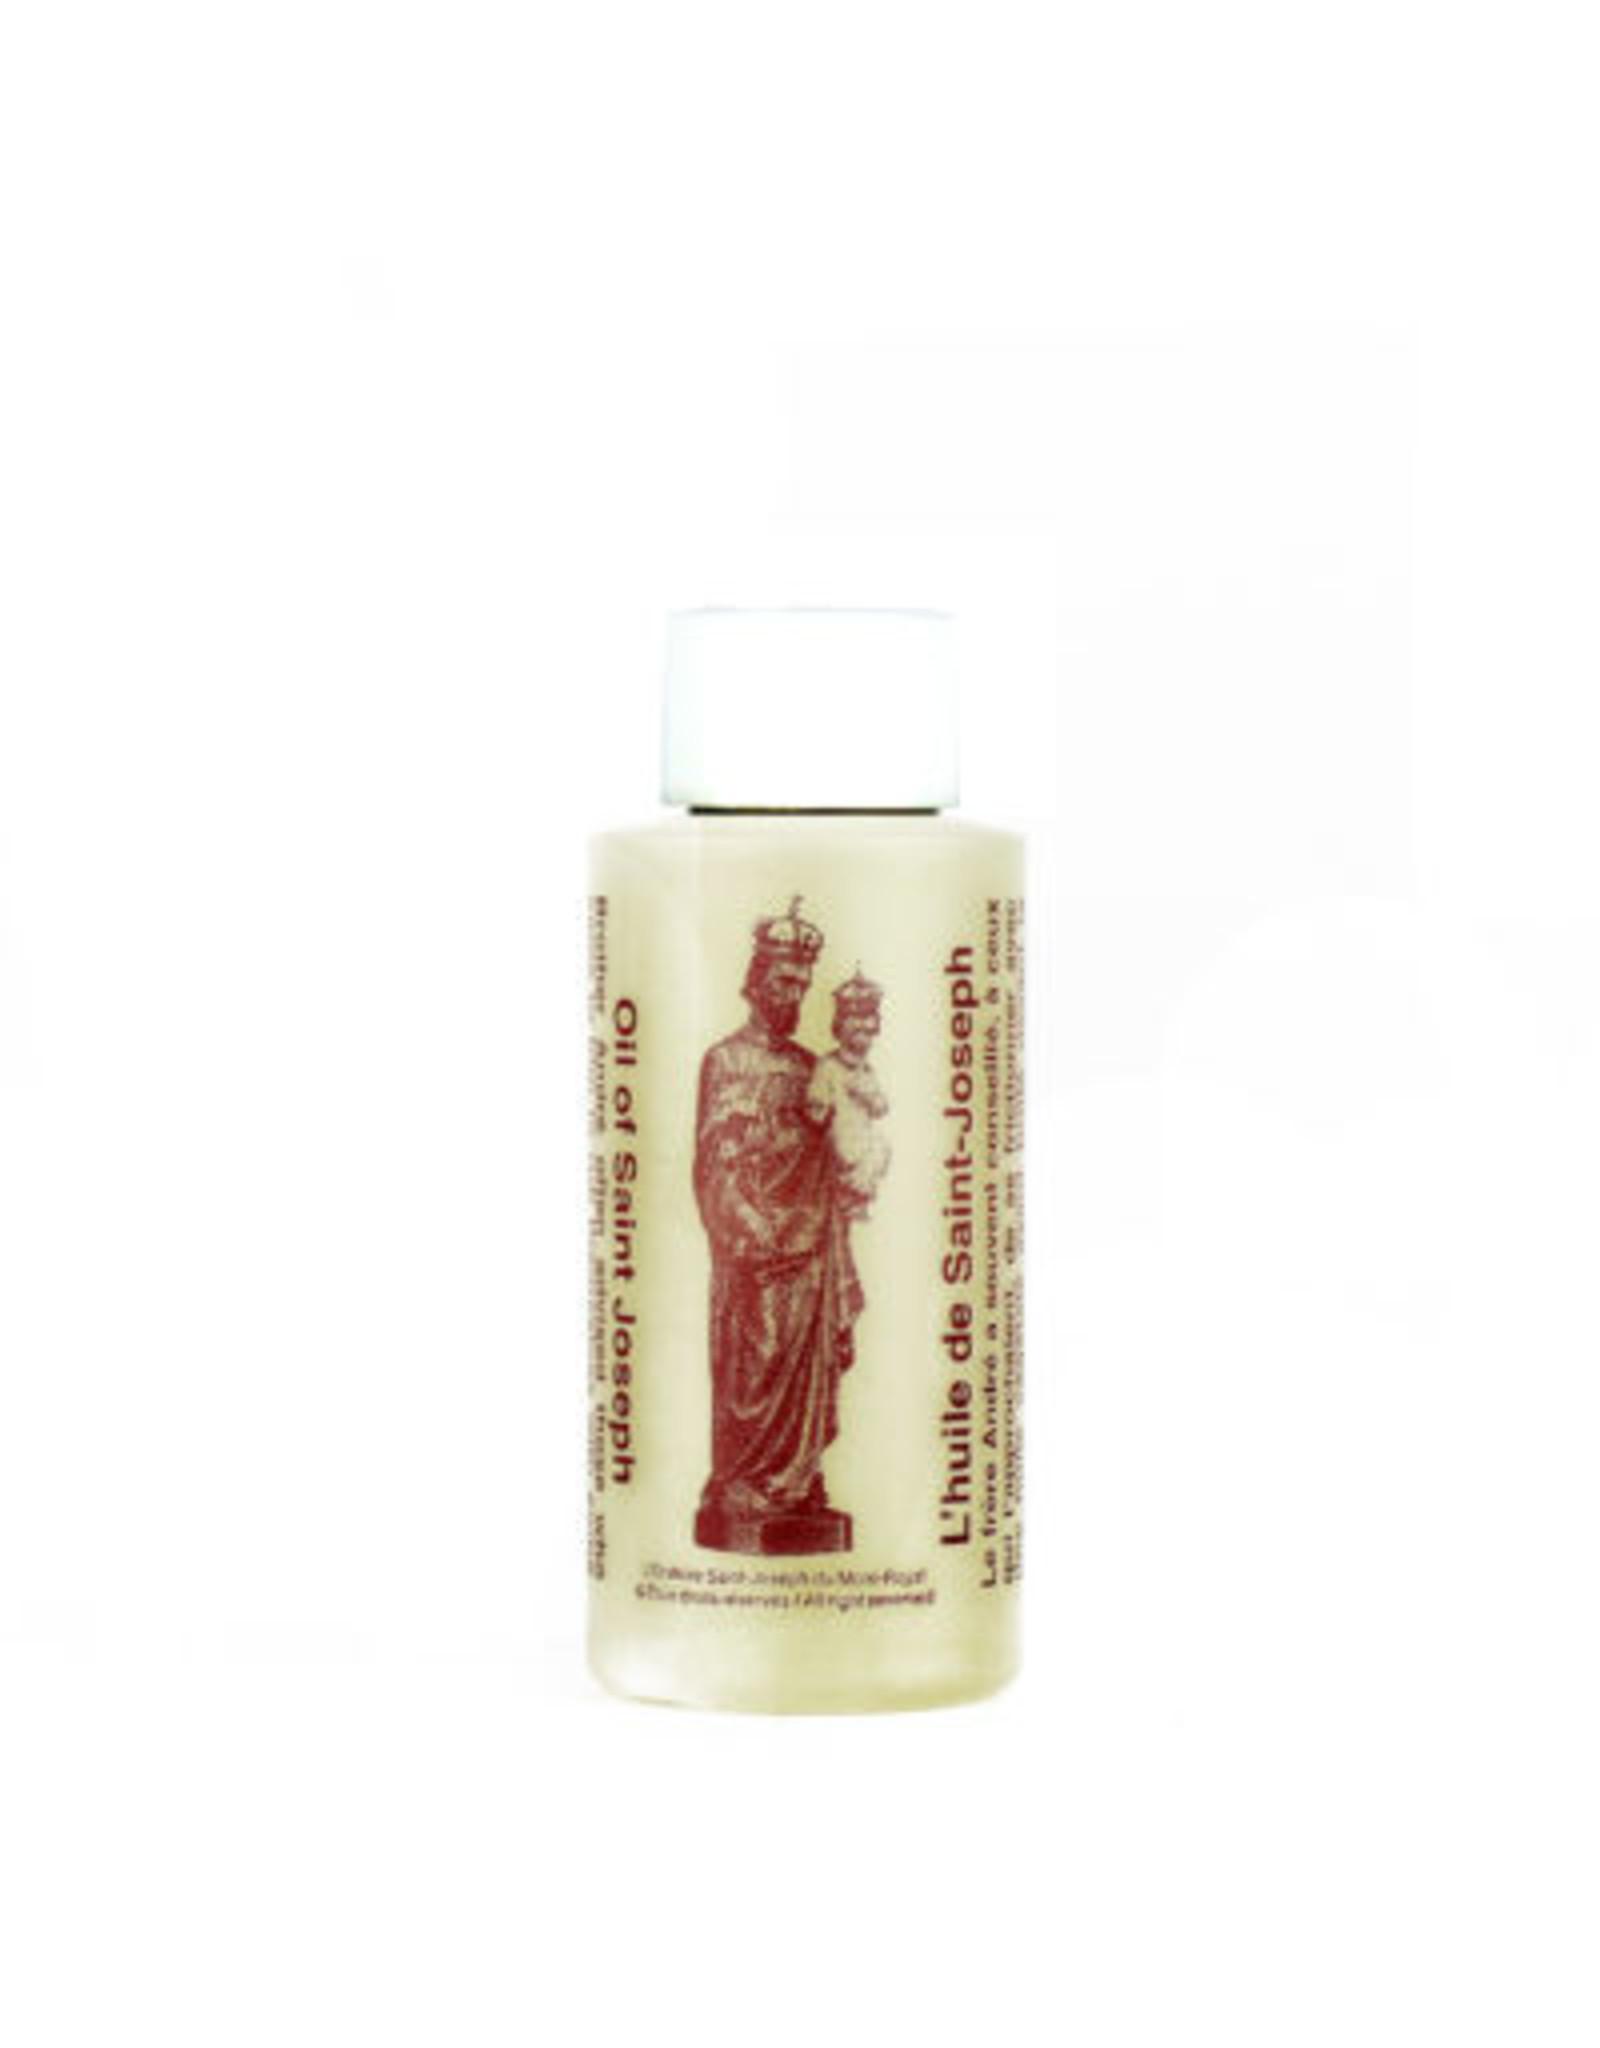 L'Oratoire Saint-Joseph du Mont-Royal Oil of Saint Joseph - 5 bottles of 60ml